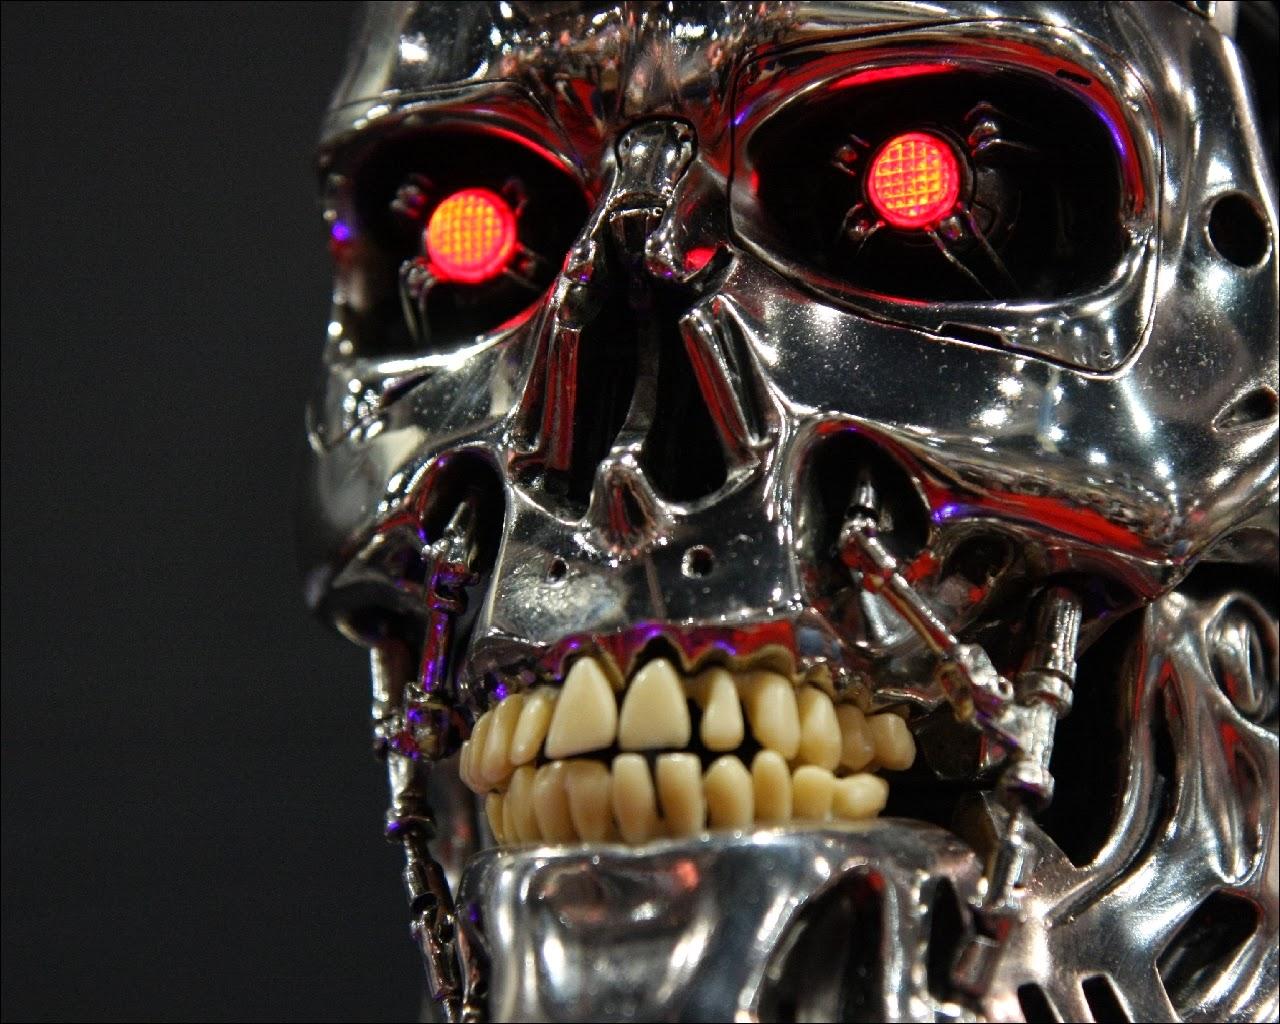 Terminator Robot Hd Images - impremedia.net - 272.1KB